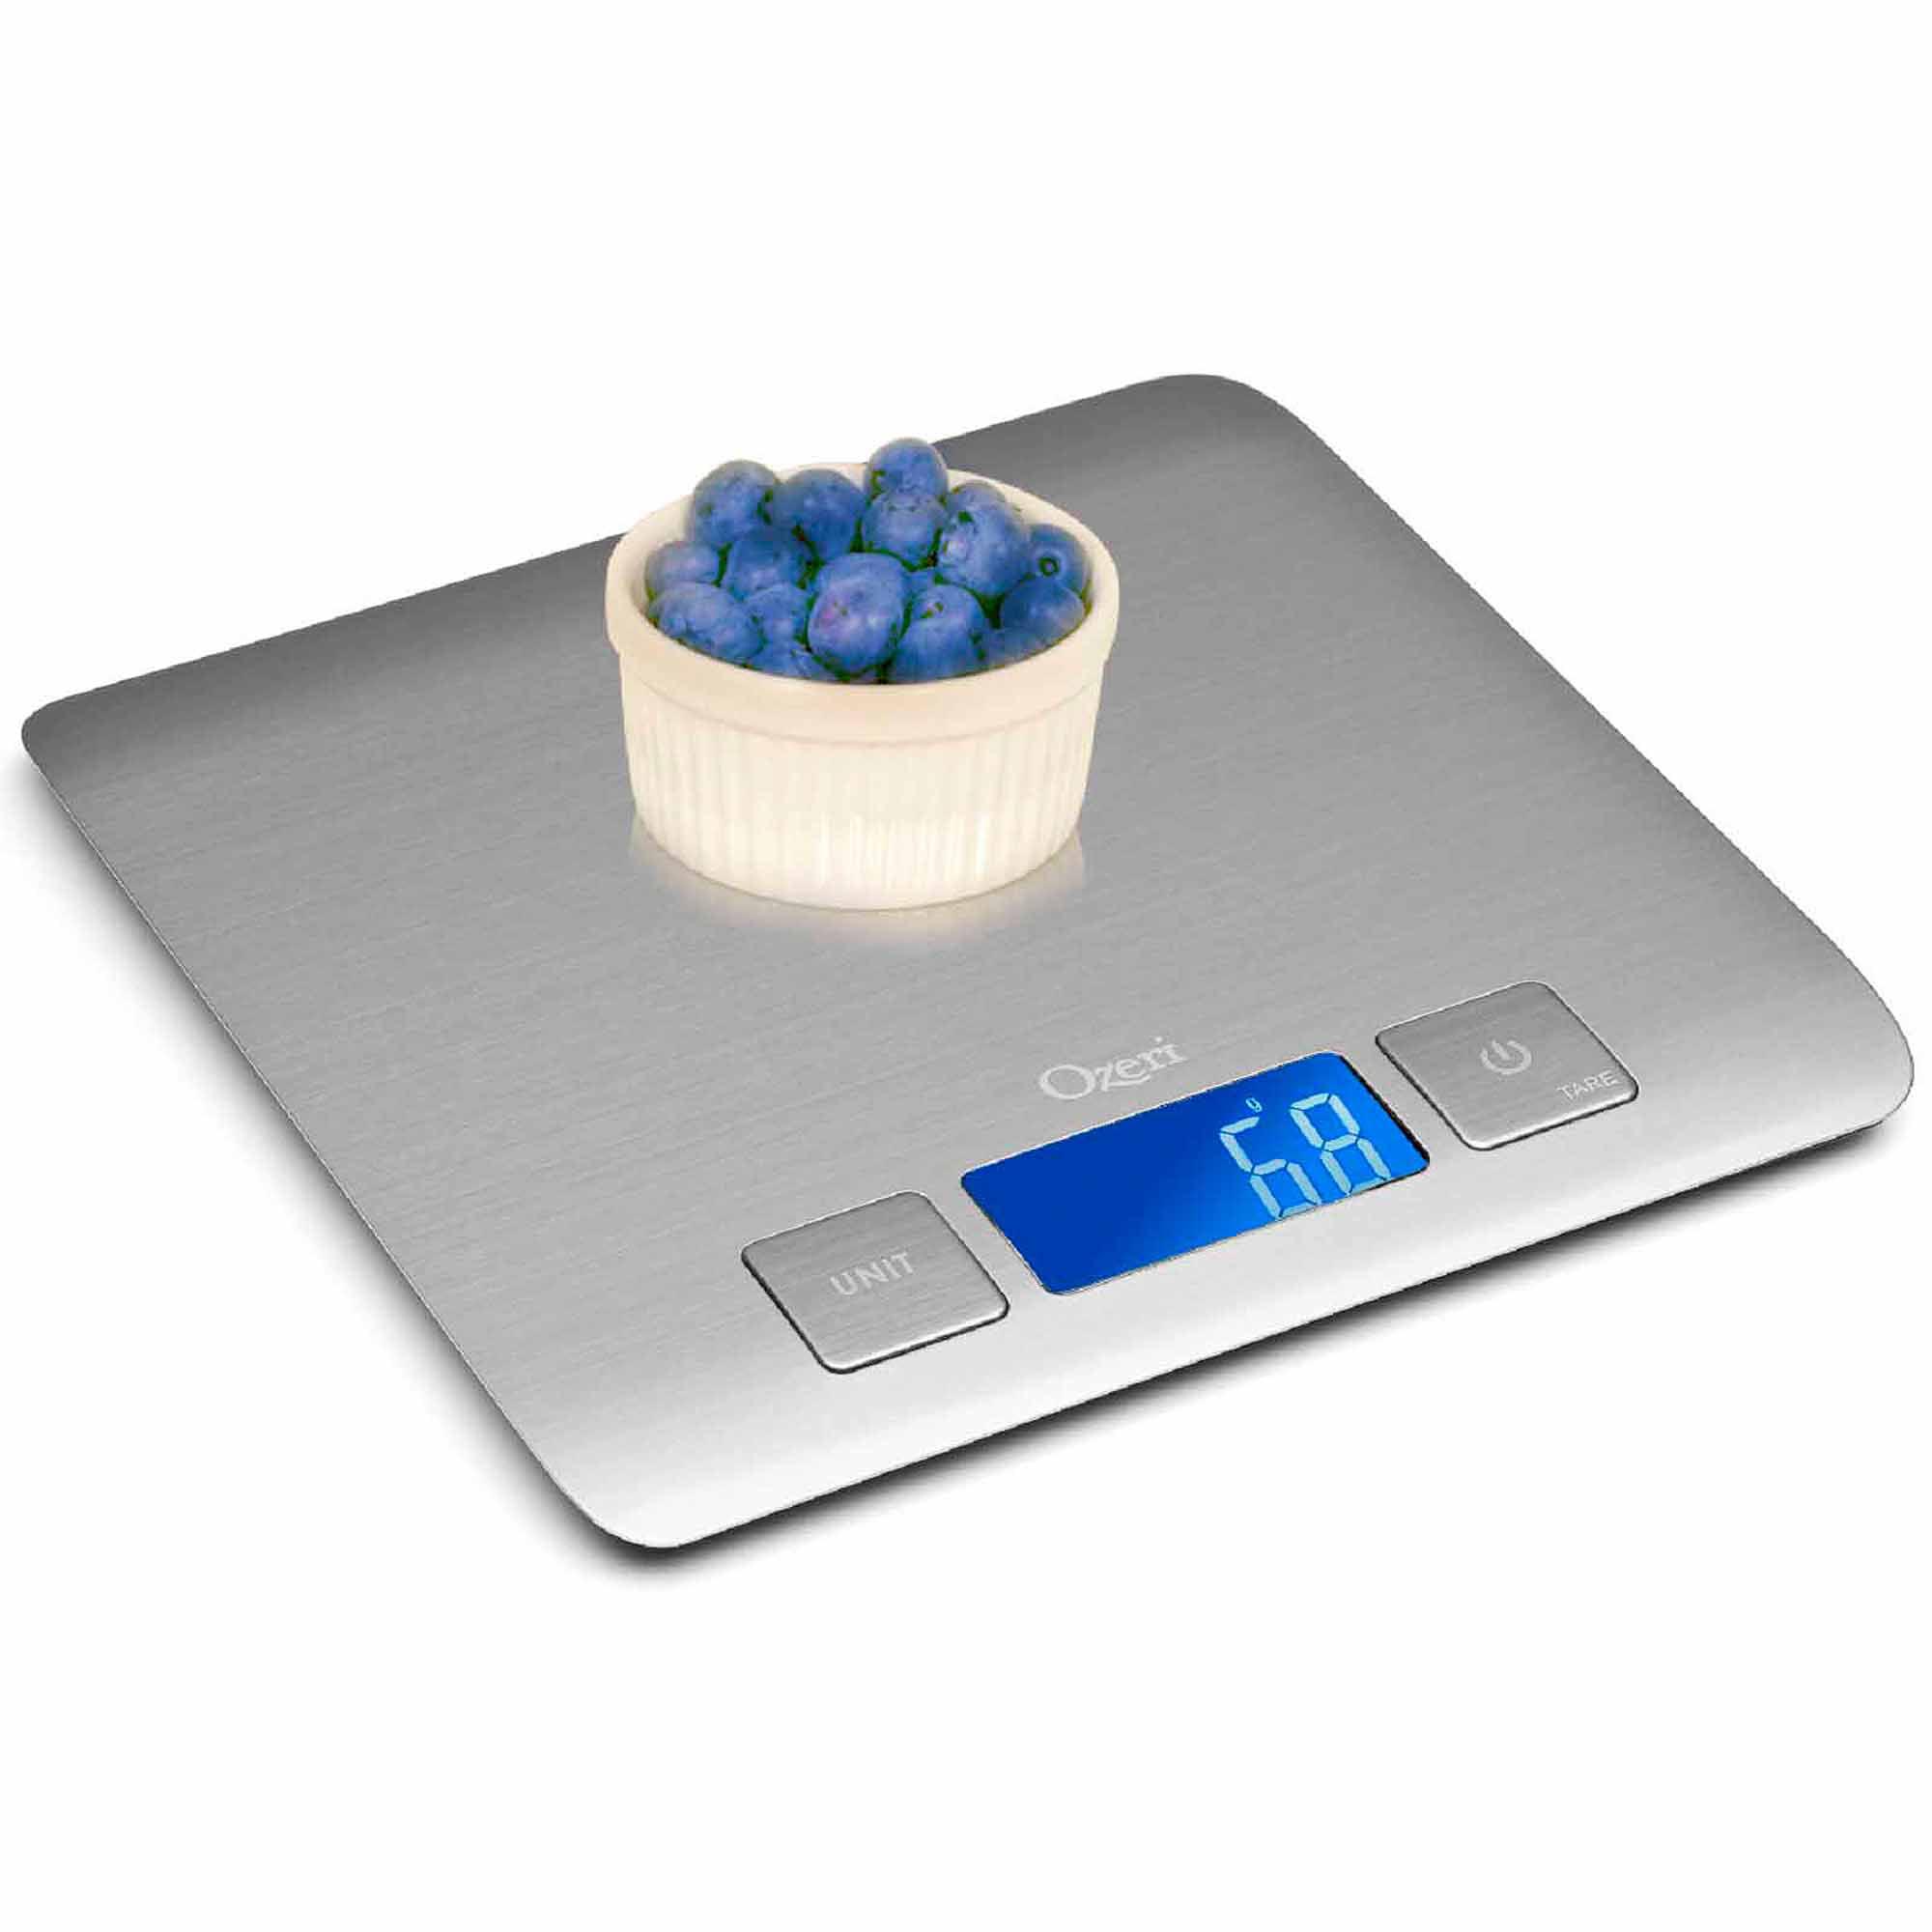 Batteries:Taylor 3831BL Biggest Loser Digital Kitchen Scale 2 Pc/'s Energizer2032